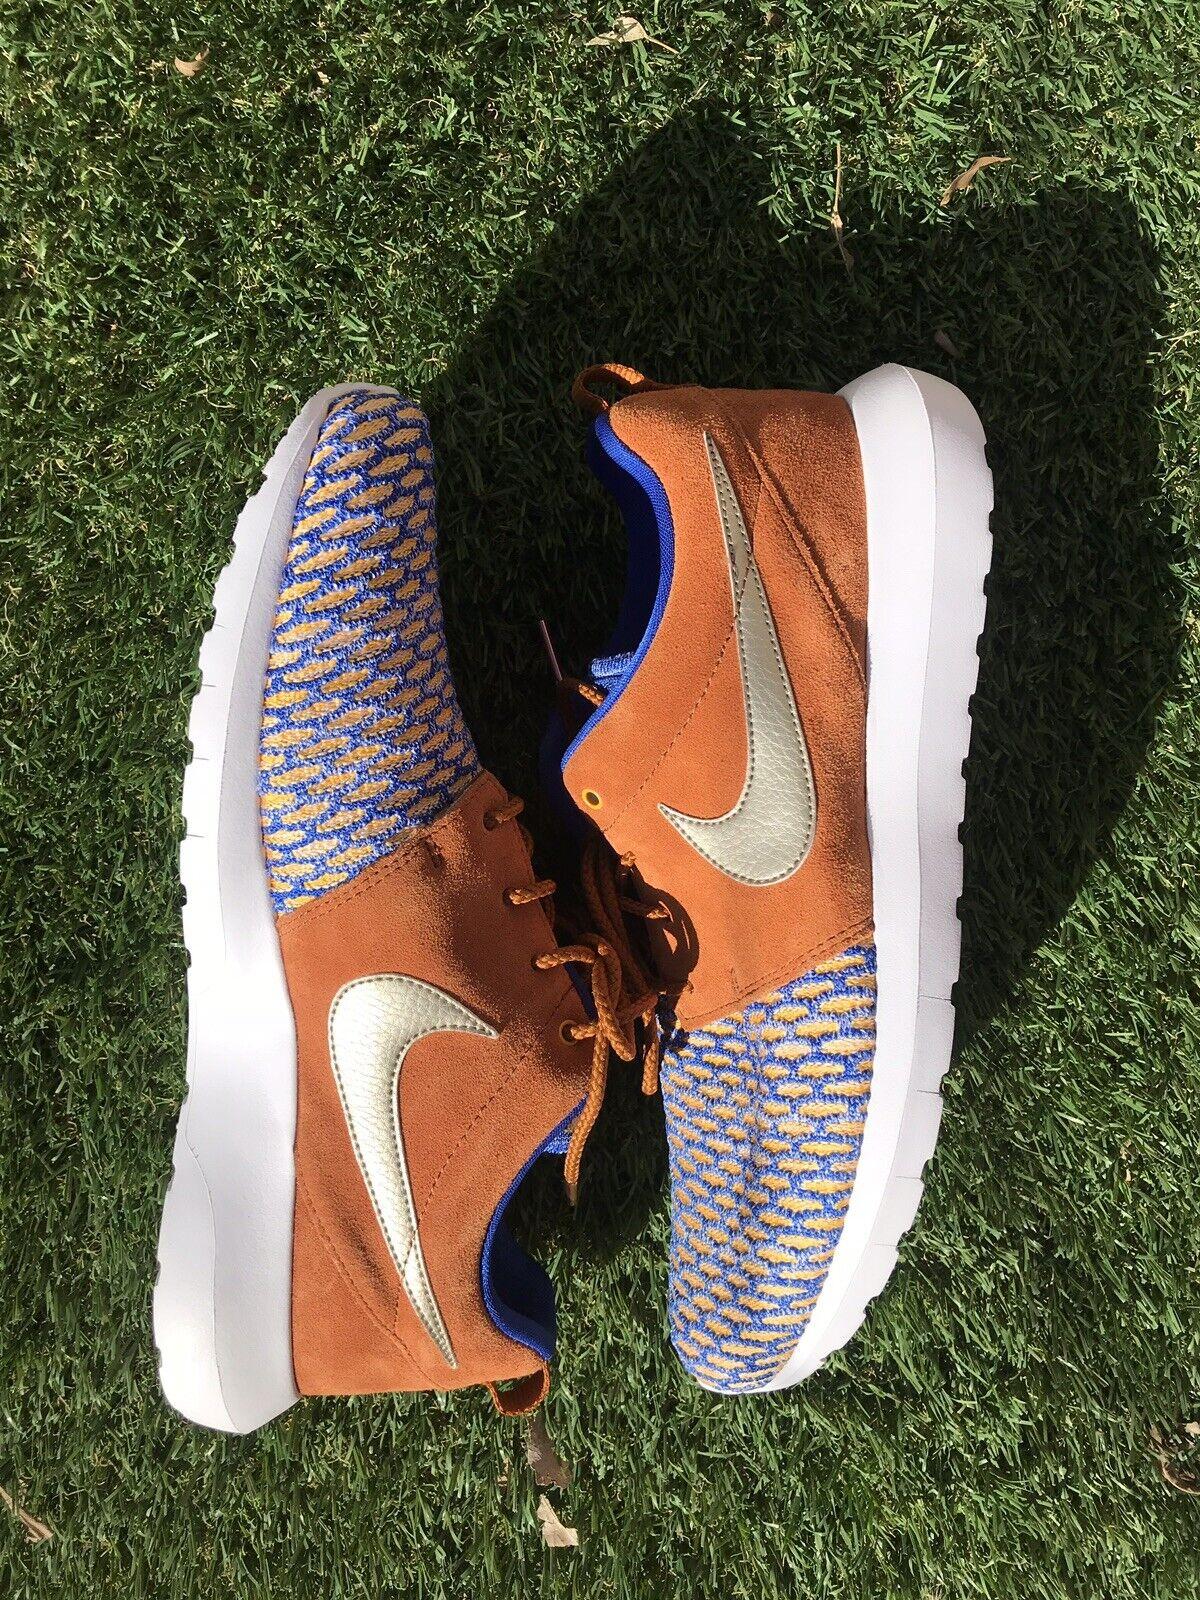 Nike Roshe Flyknit Tawny PRM Premium Game Royal Metallic Size 10.5  (746825-402)